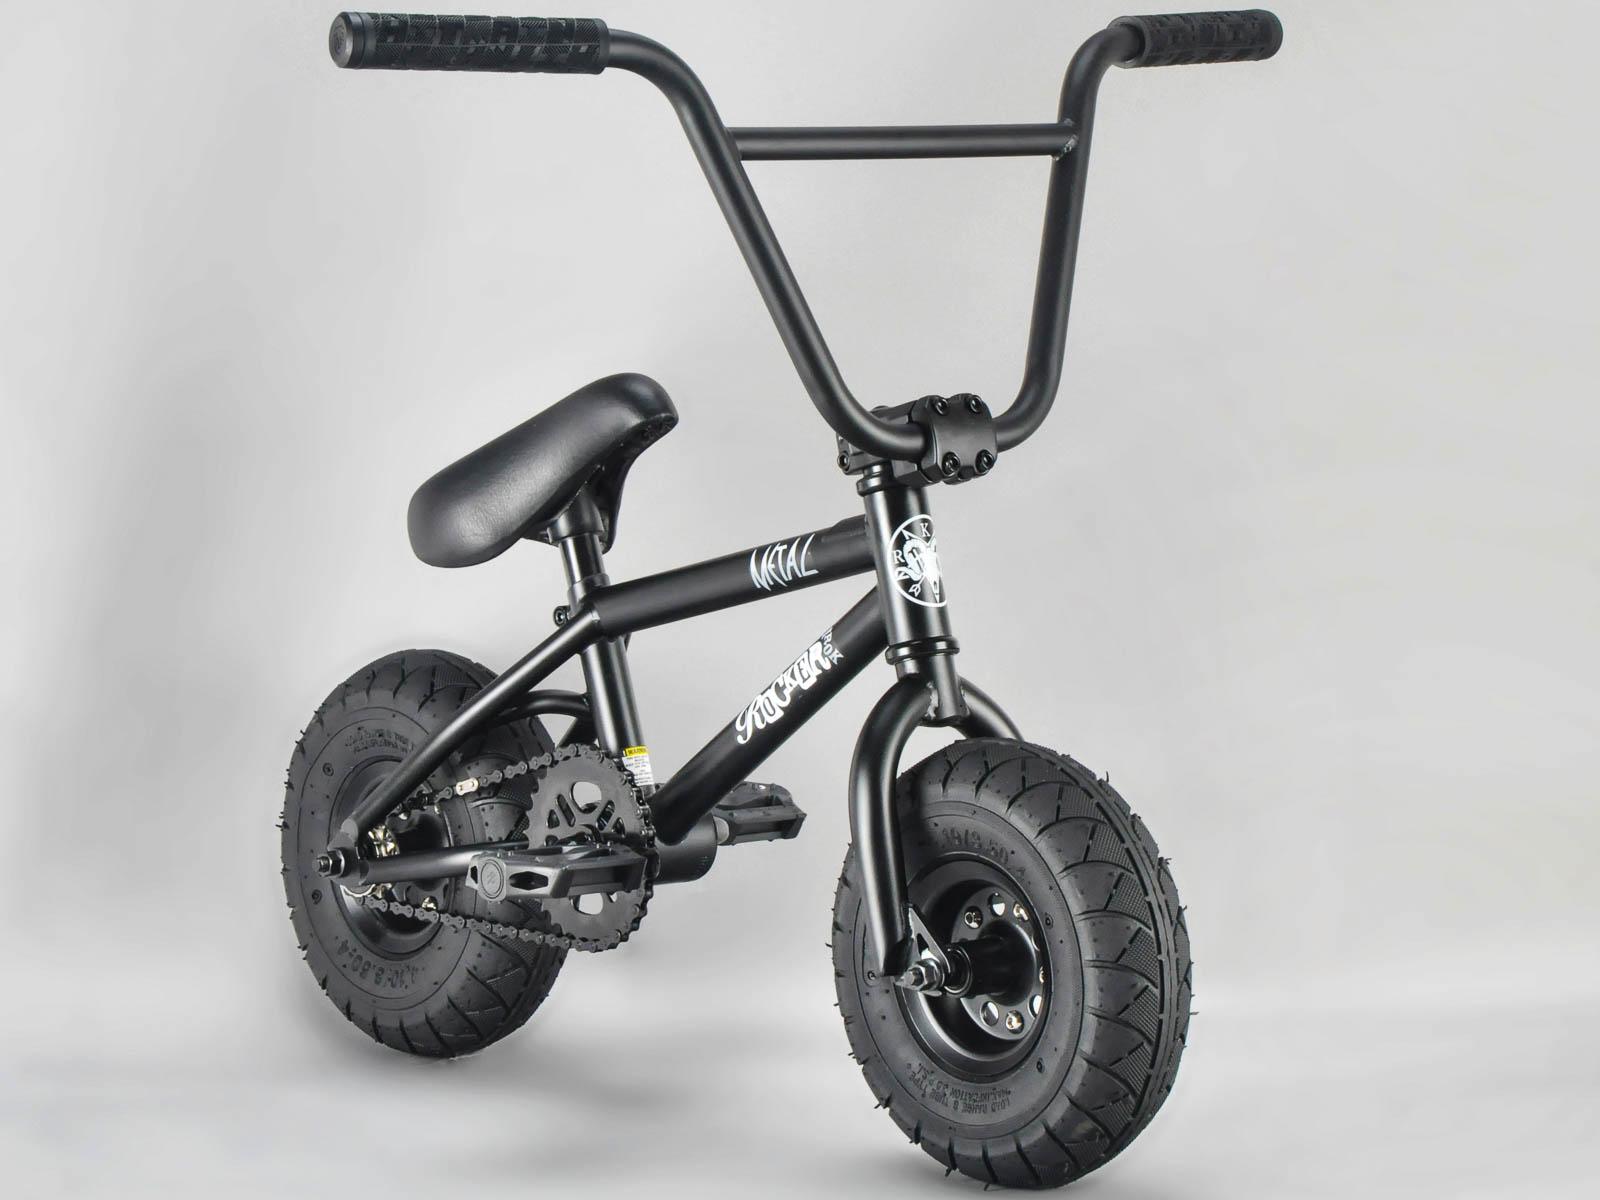 genuine rocker metal irok bmx rkr mini bmx bike. Black Bedroom Furniture Sets. Home Design Ideas